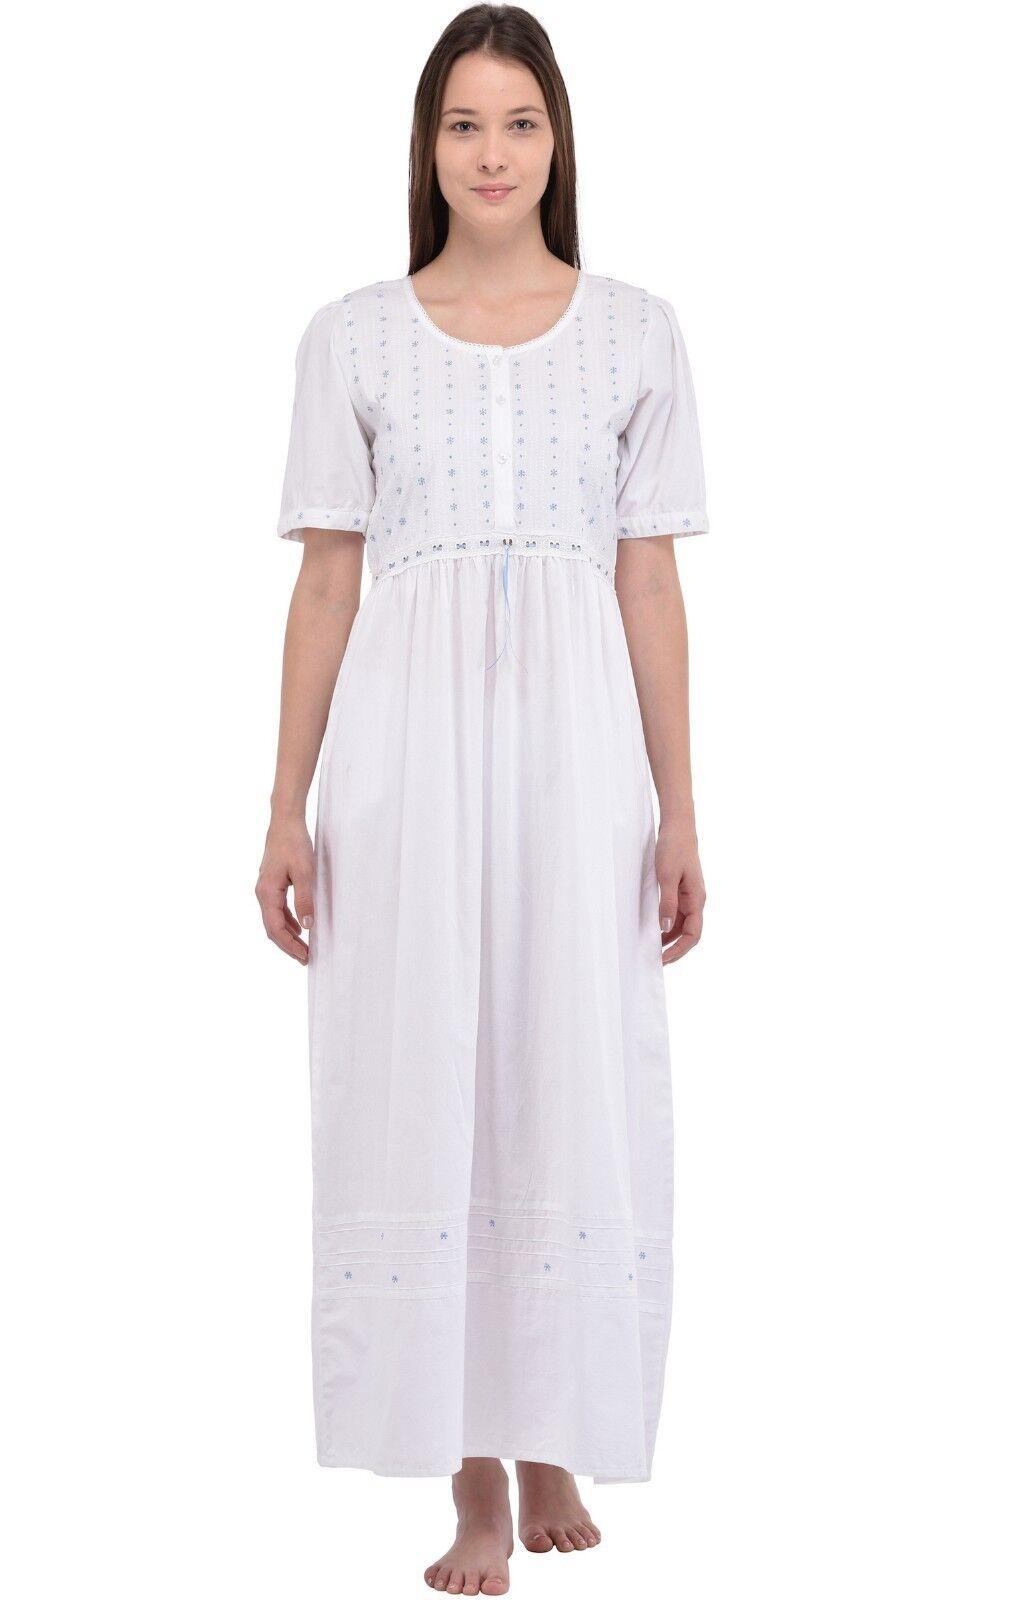 Ladies Classic Short Sleeve Nightdress   Cotton Lane